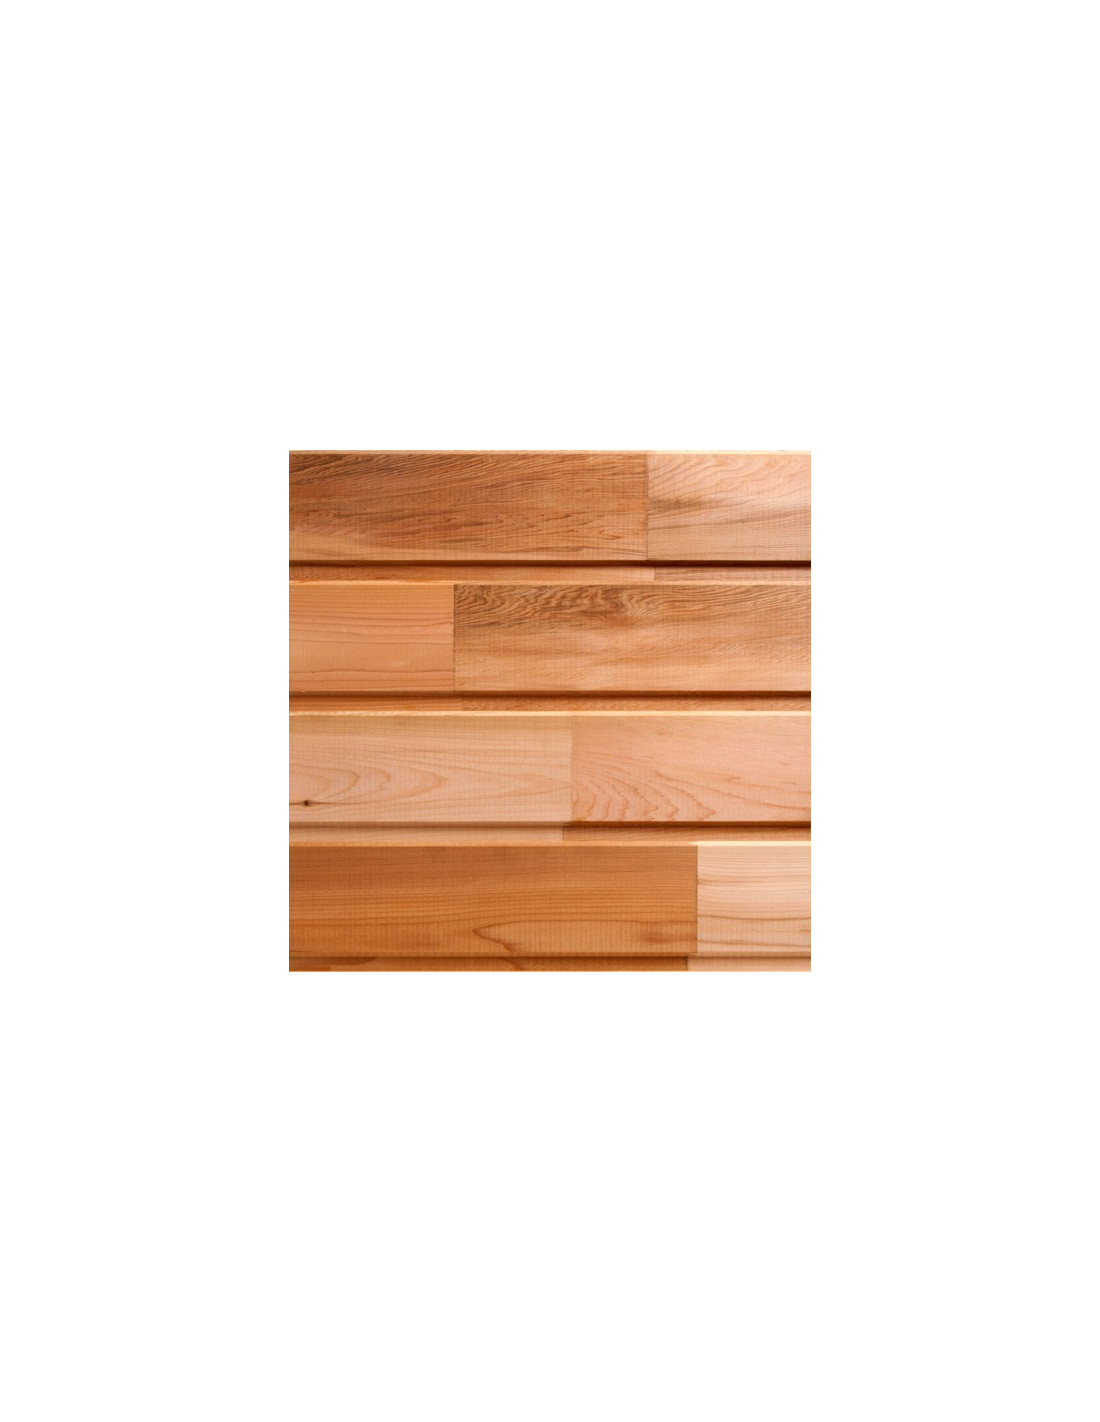 bardage red cedar clear 2 saint louis 18x137mm. Black Bedroom Furniture Sets. Home Design Ideas